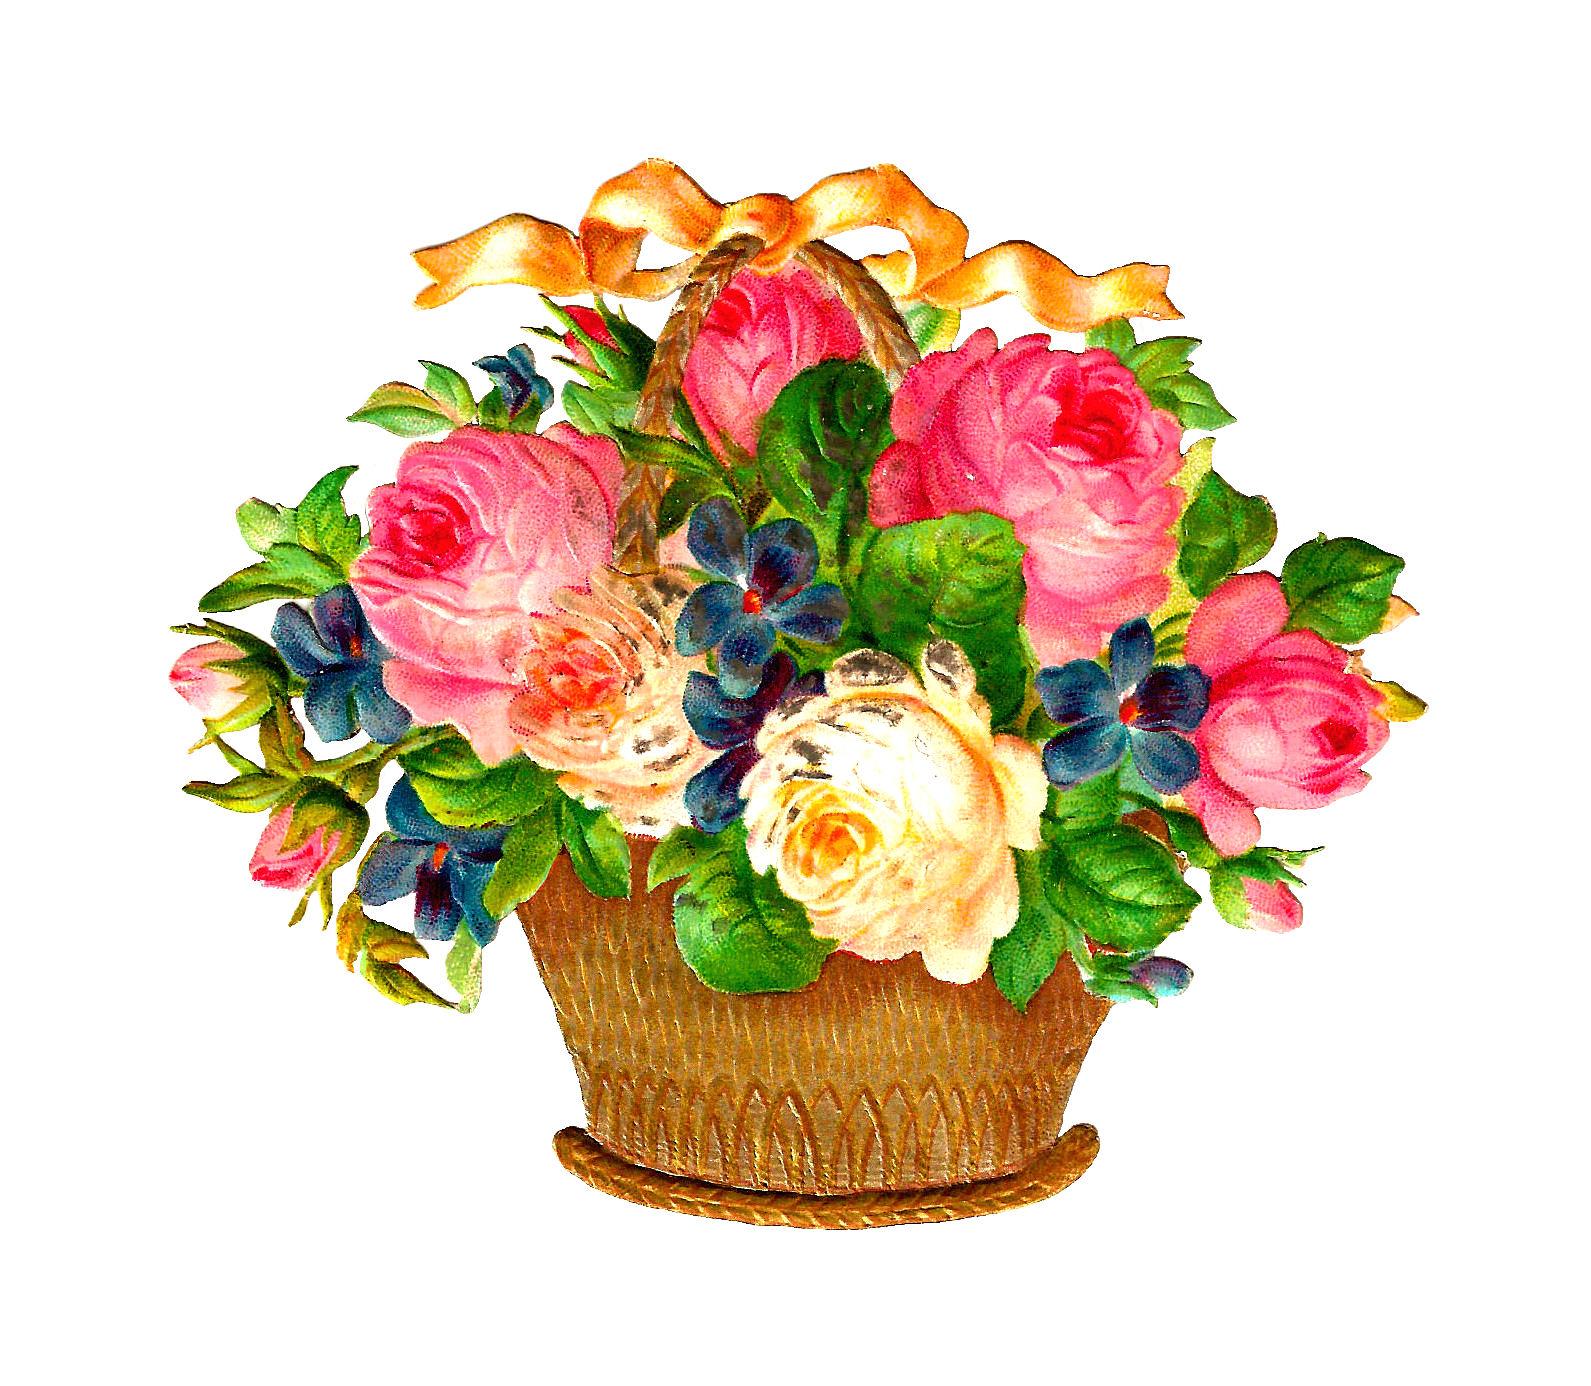 Flower Basket Clipart.